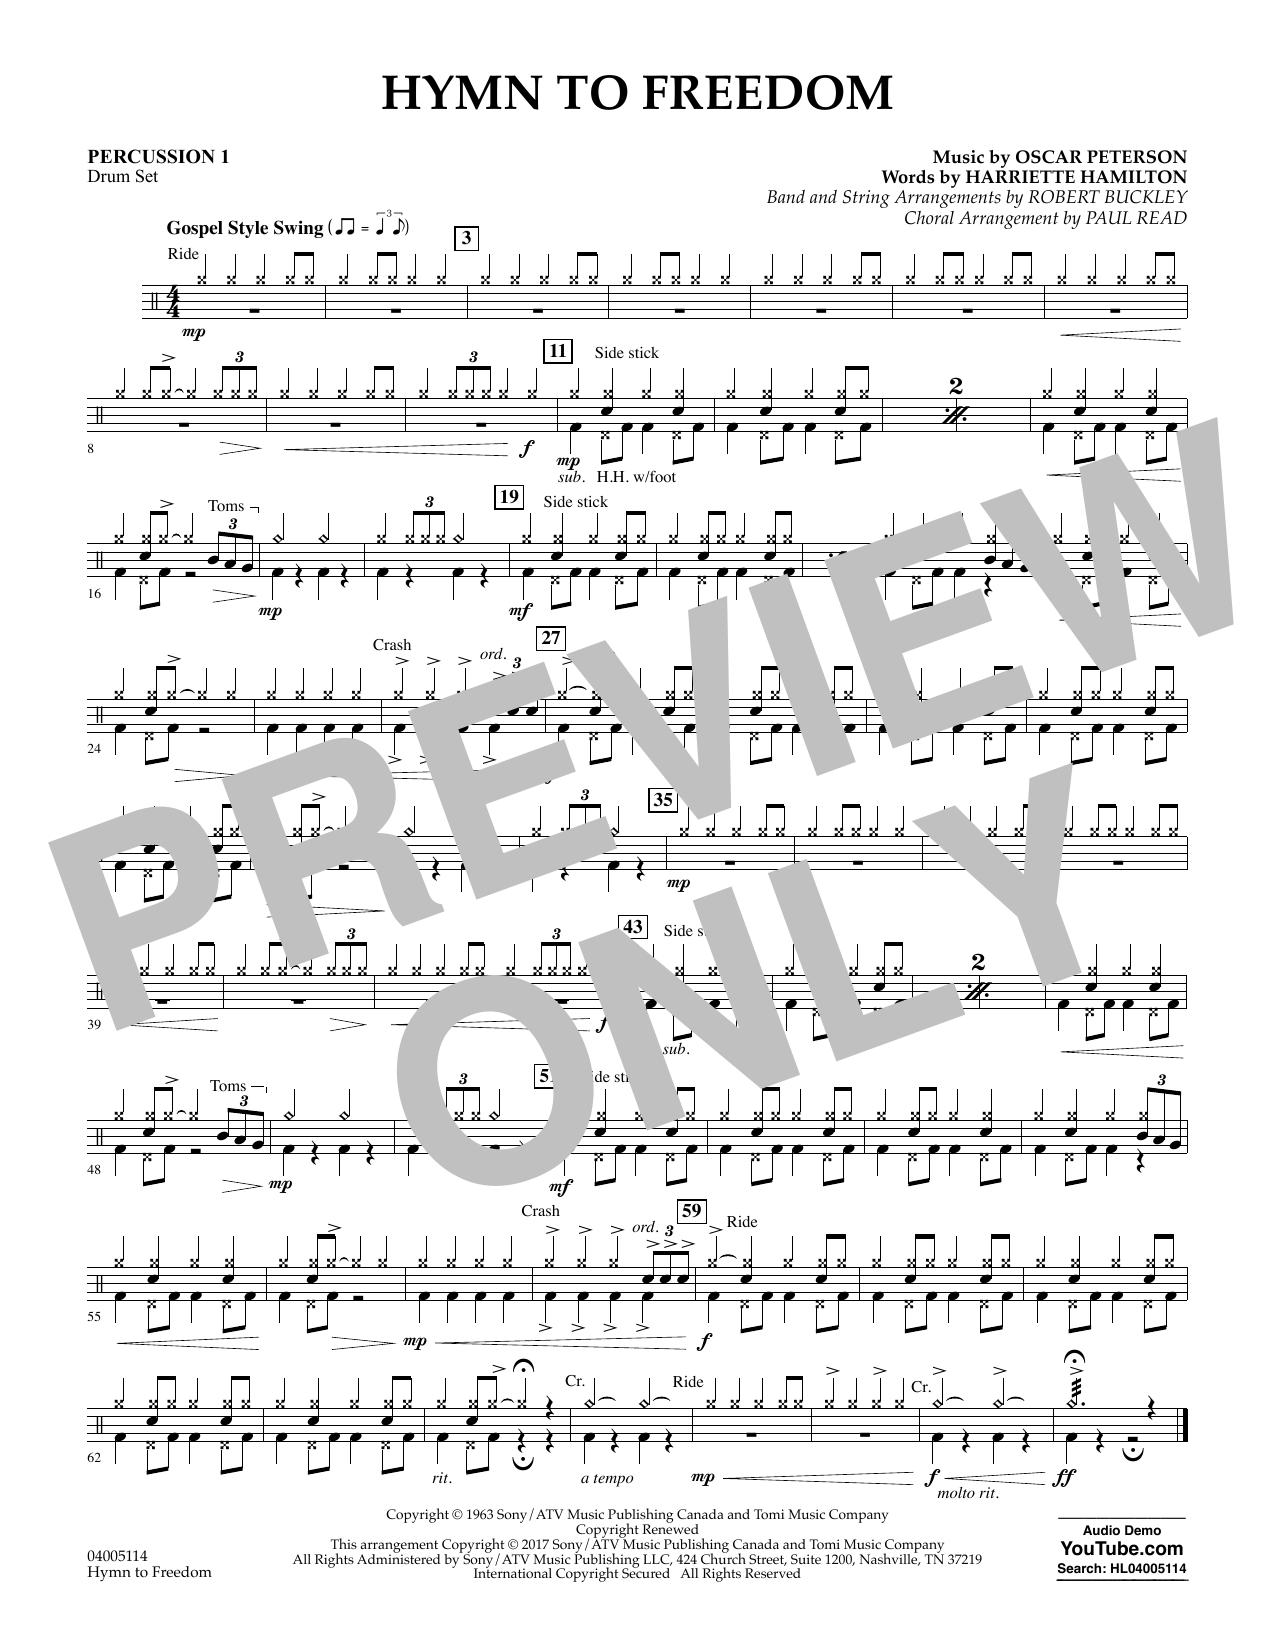 Hymn to Freedom - Percussion 1 (Flex-Band)